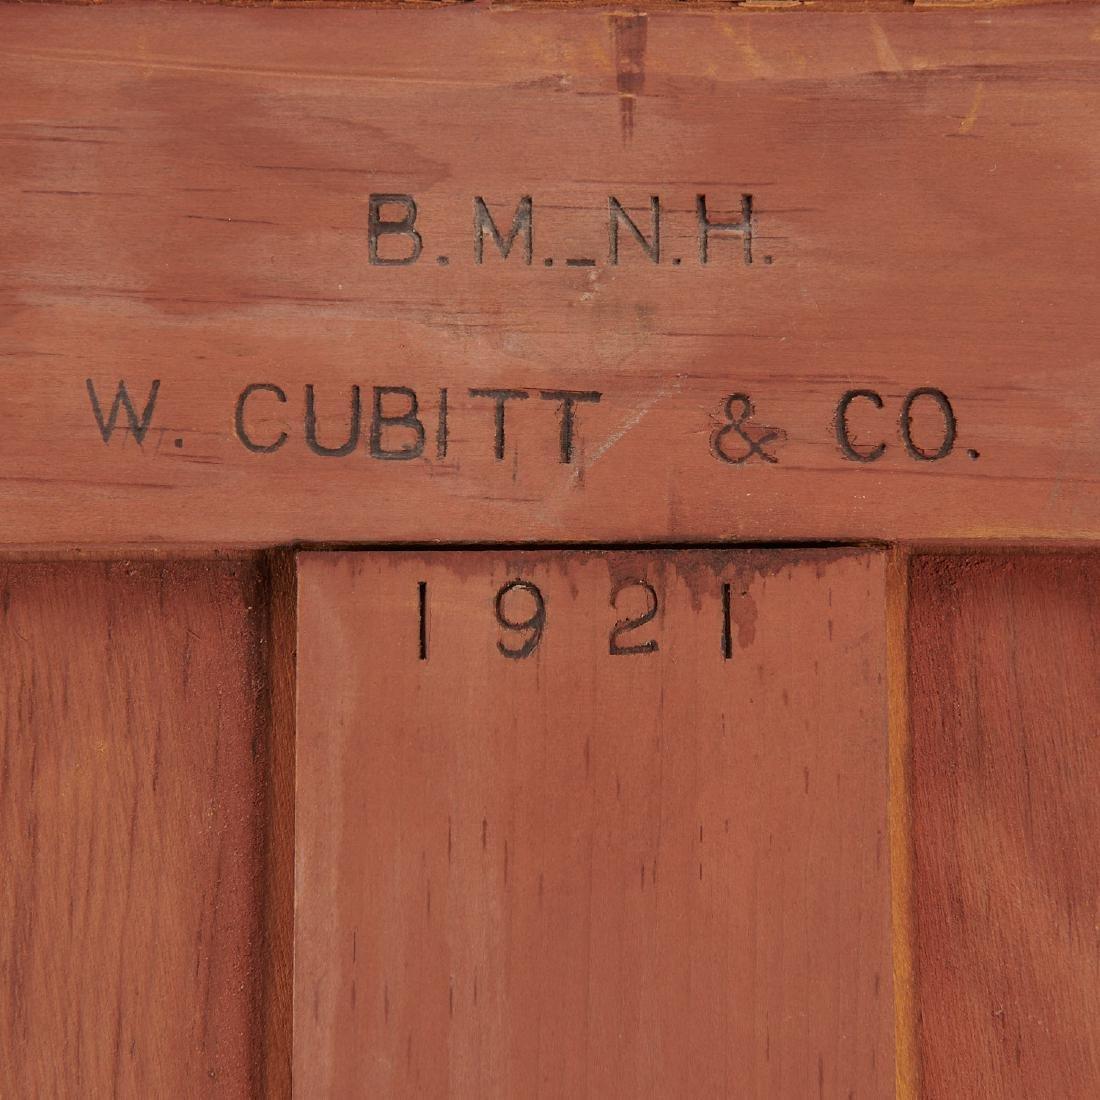 British Museum specimen cabinet by W. Cubitt & Co - 9